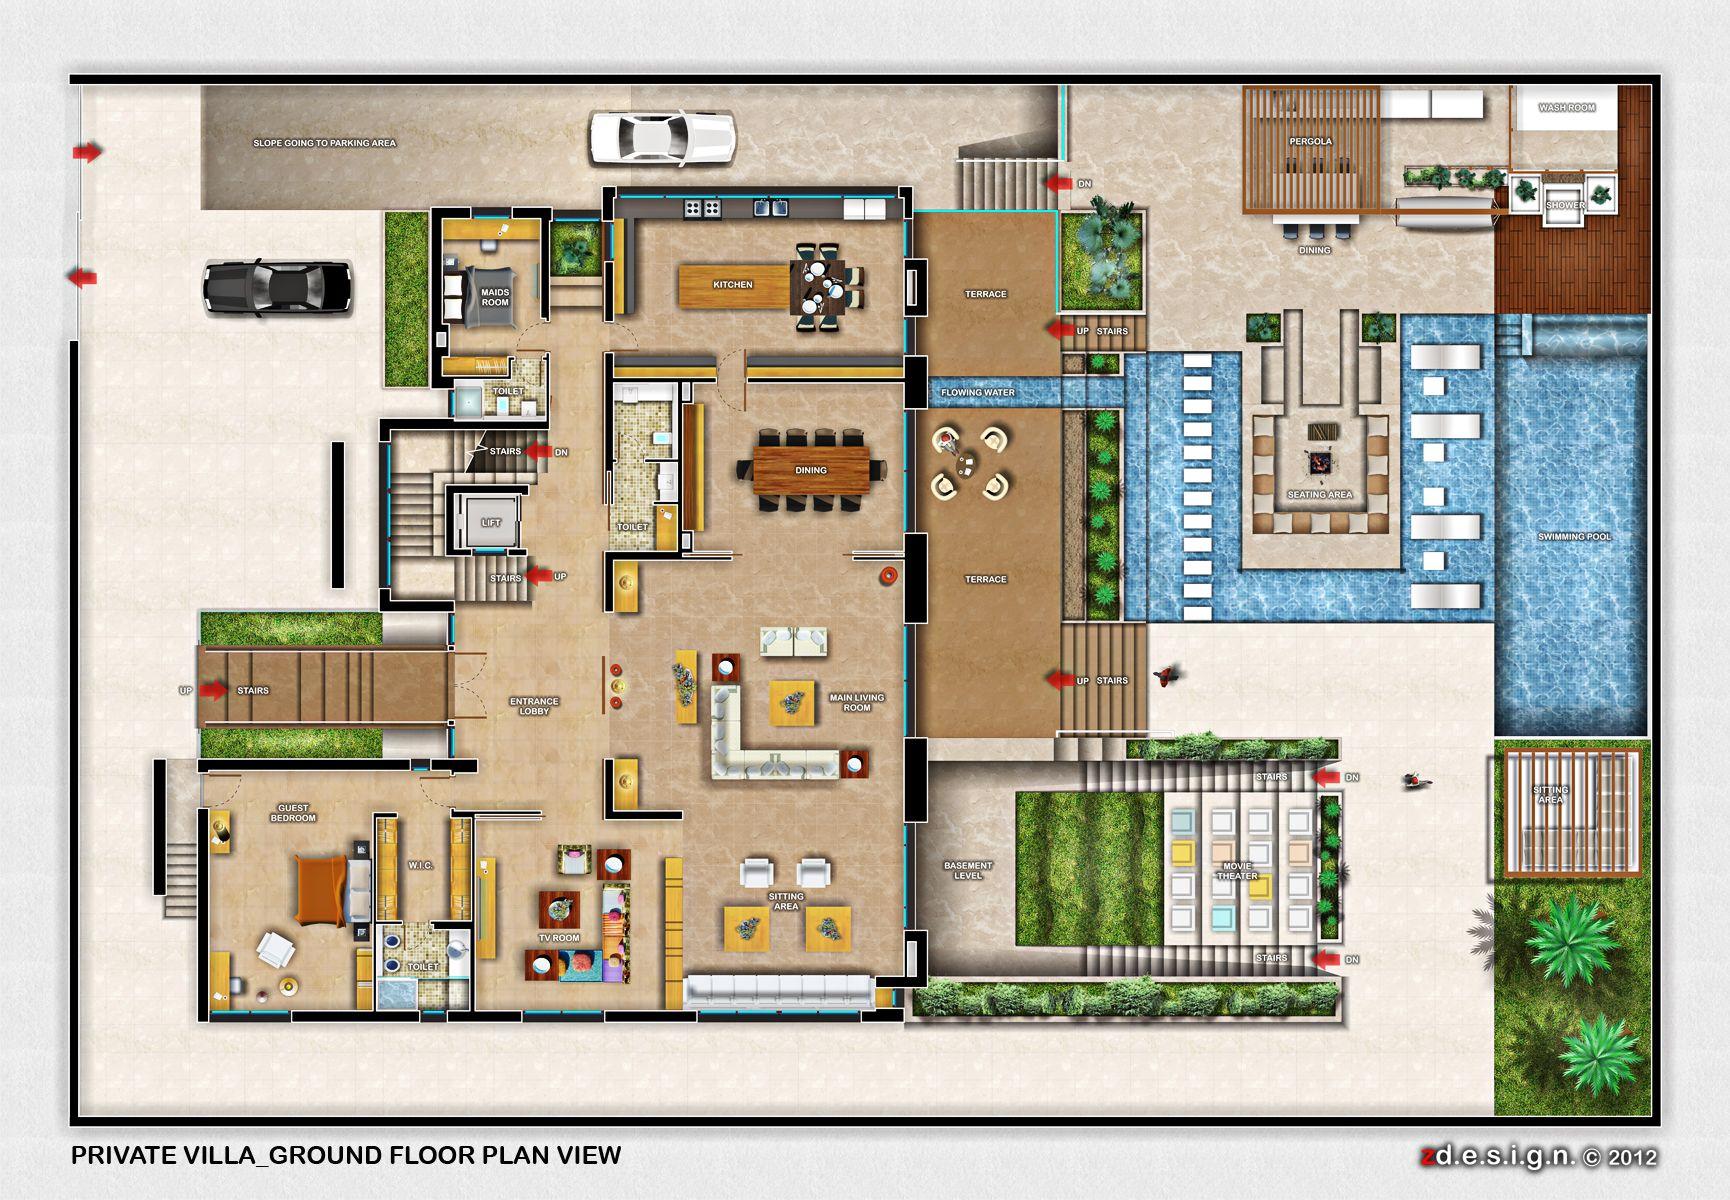 33 2d C O R E L Ideas Mosque Design Islamic Architecture Snooker Room West Avenue